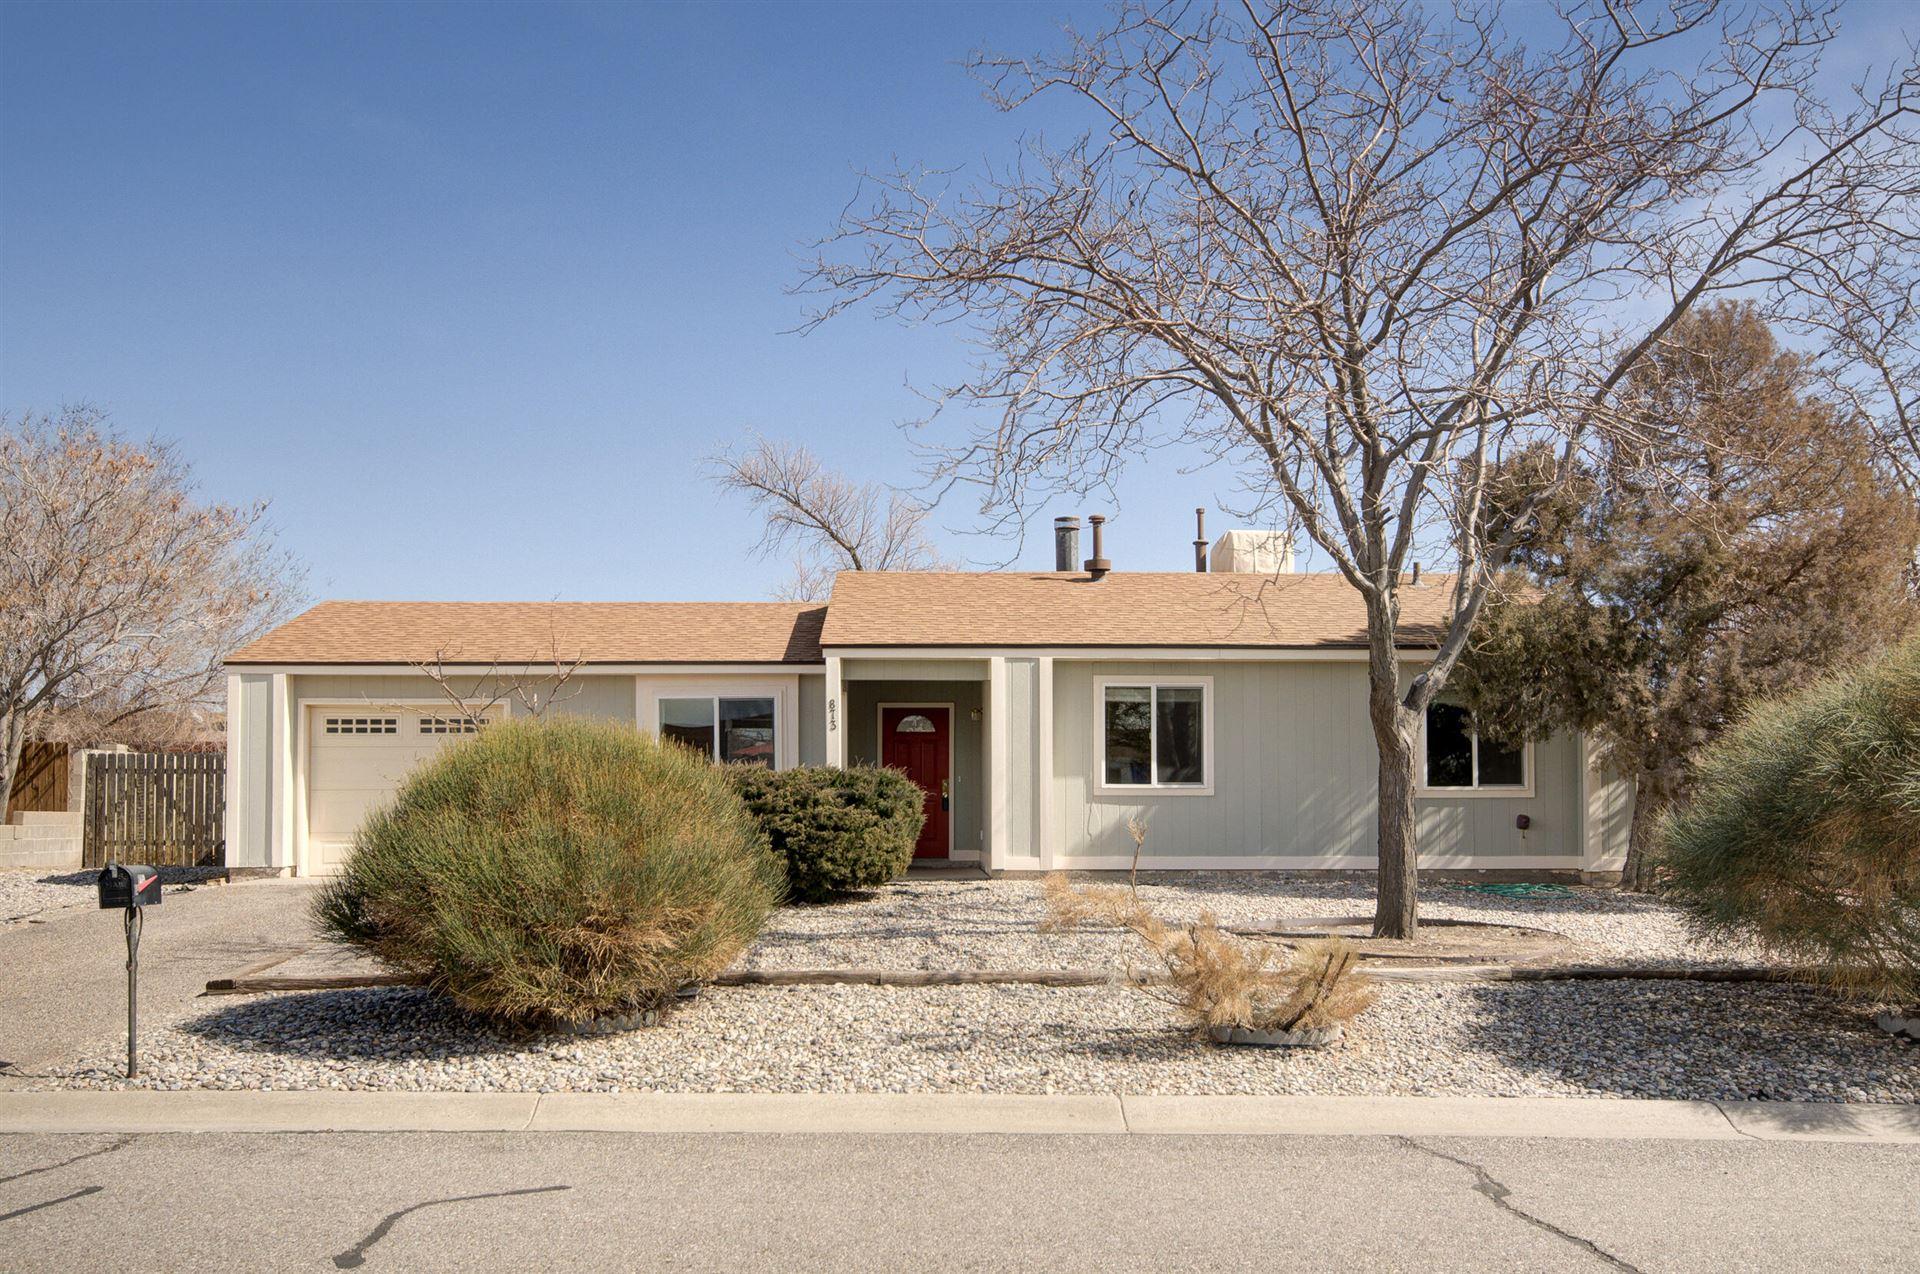 Photo of 873 MADEIRA Drive SE, Rio Rancho, NM 87124 (MLS # 986548)